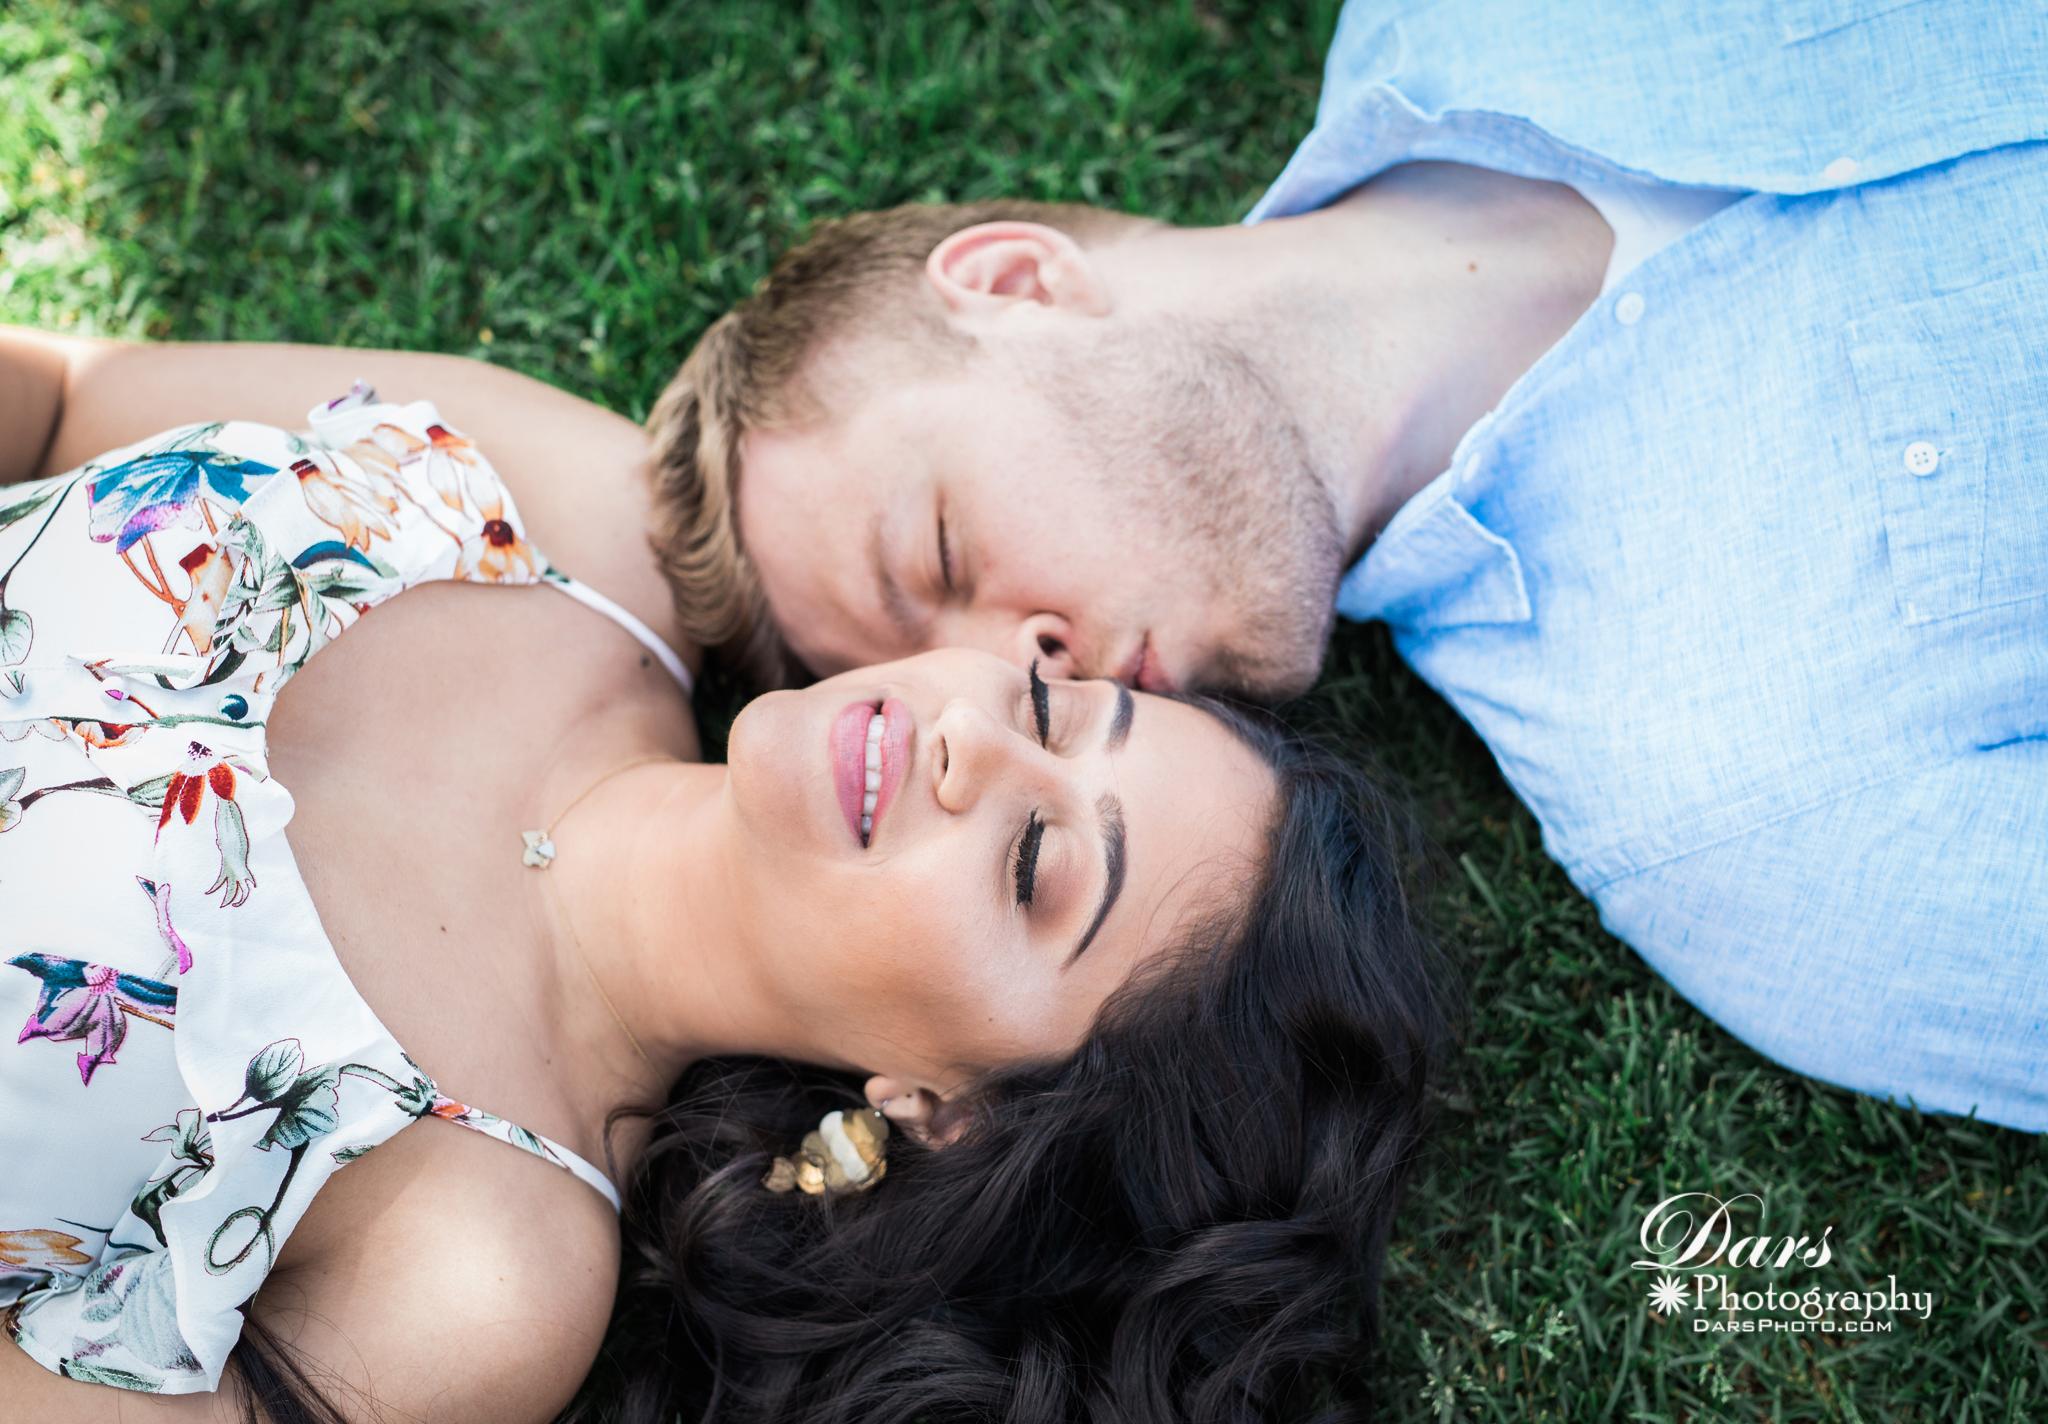 POONAM & KIRILL PRE-WEDDING PHOTO SESSION